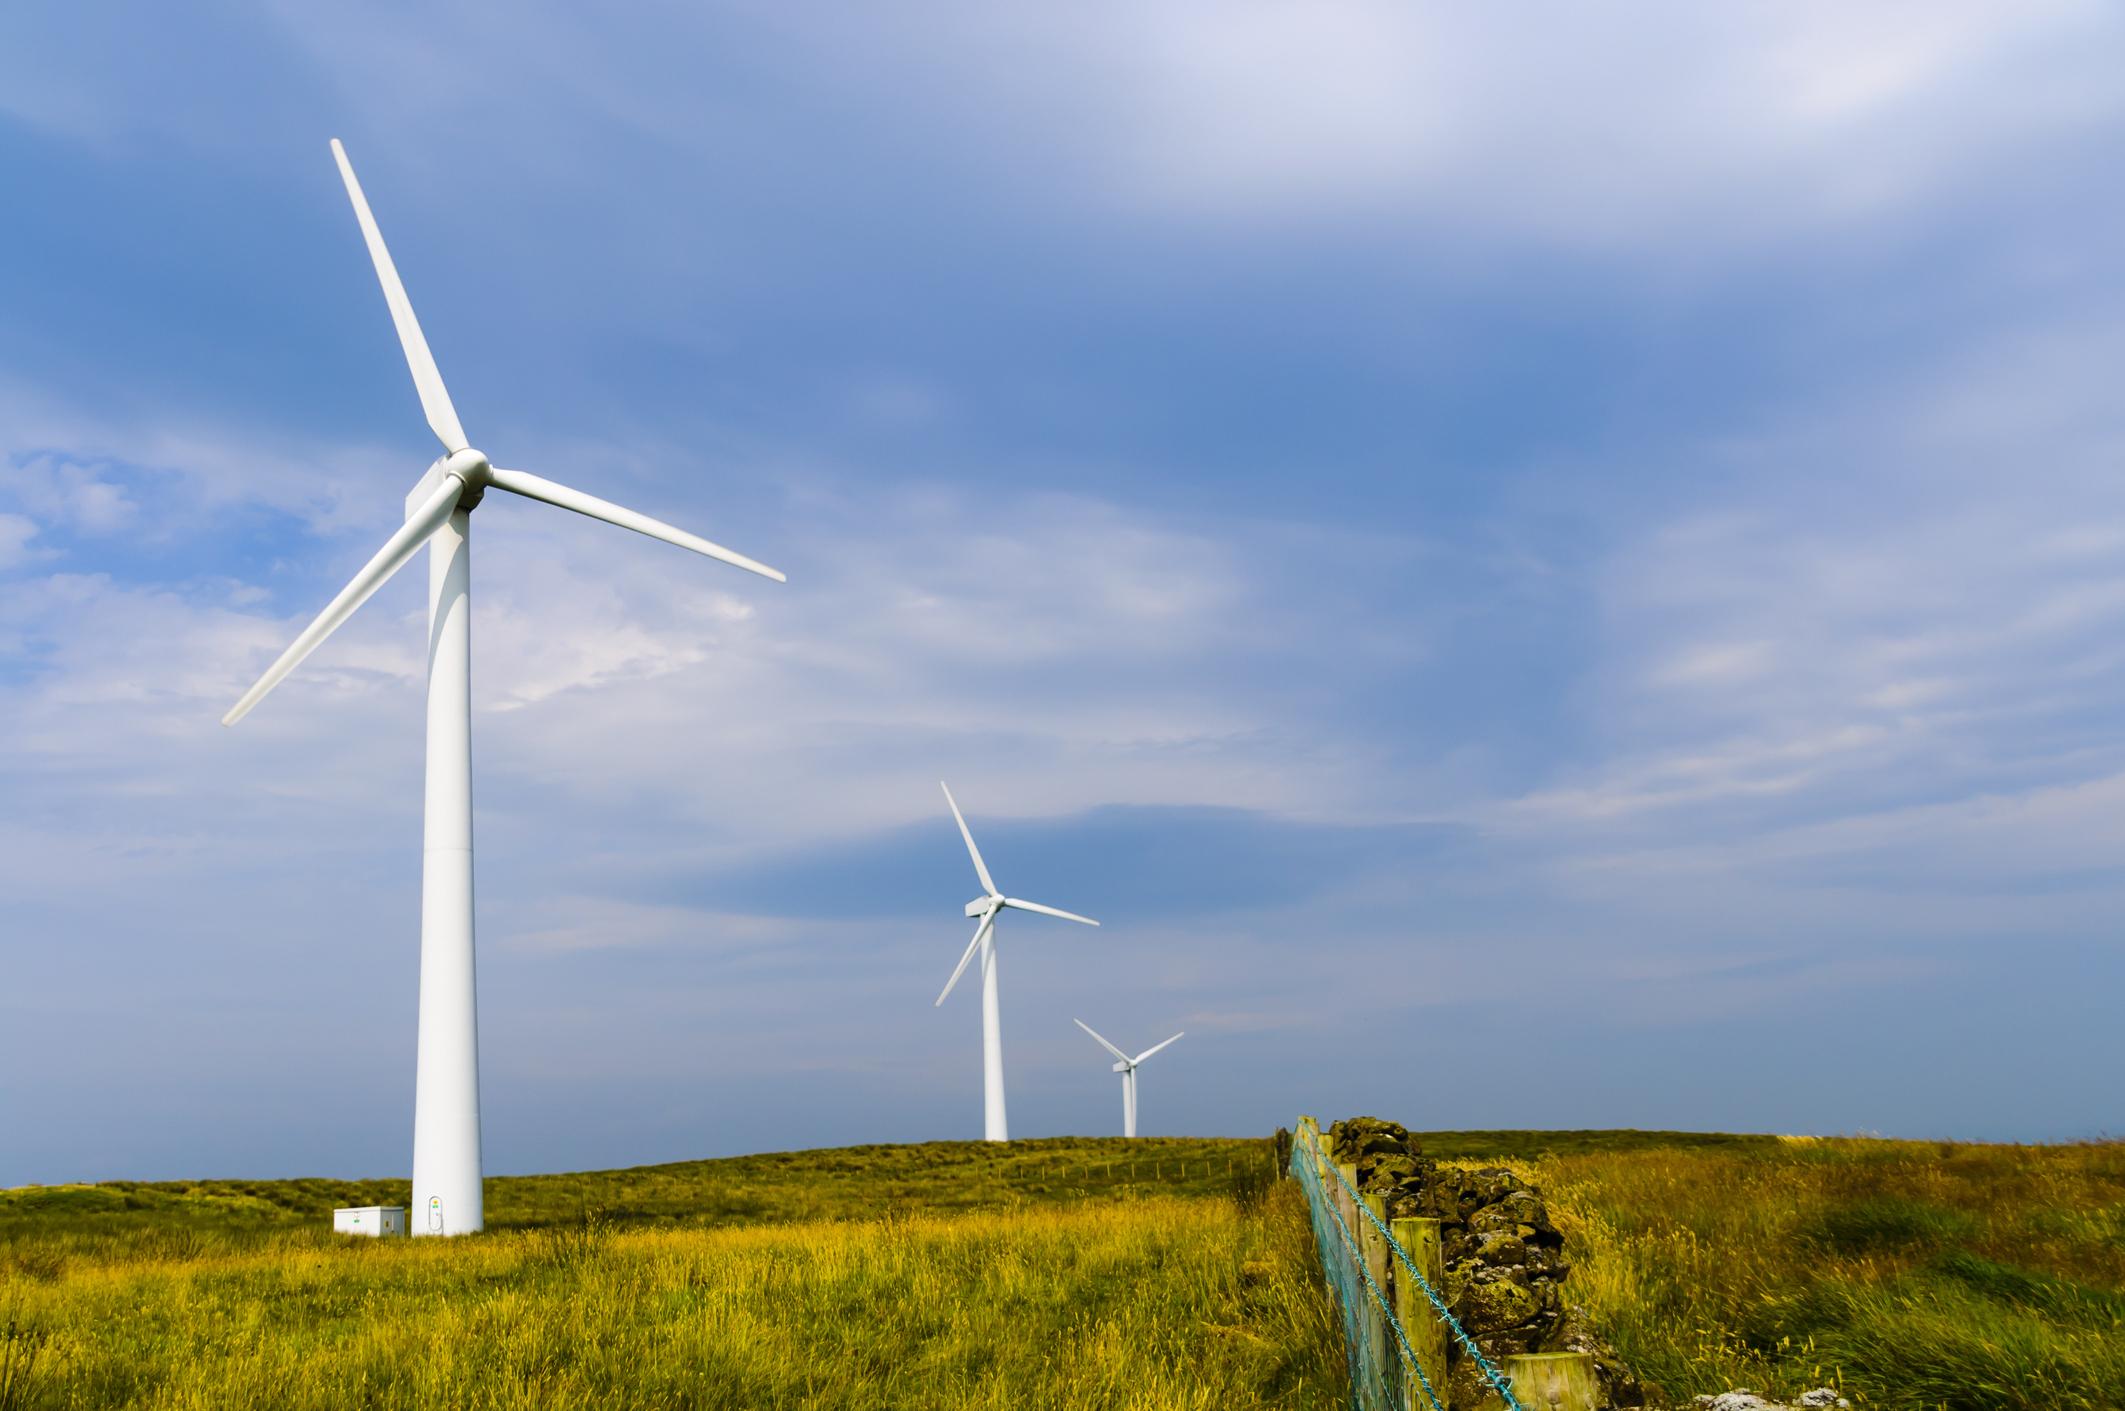 heraldscotland.com - Victoria Weldon - Scotland's ageing wind turbines could double in size in 'green' energy drive